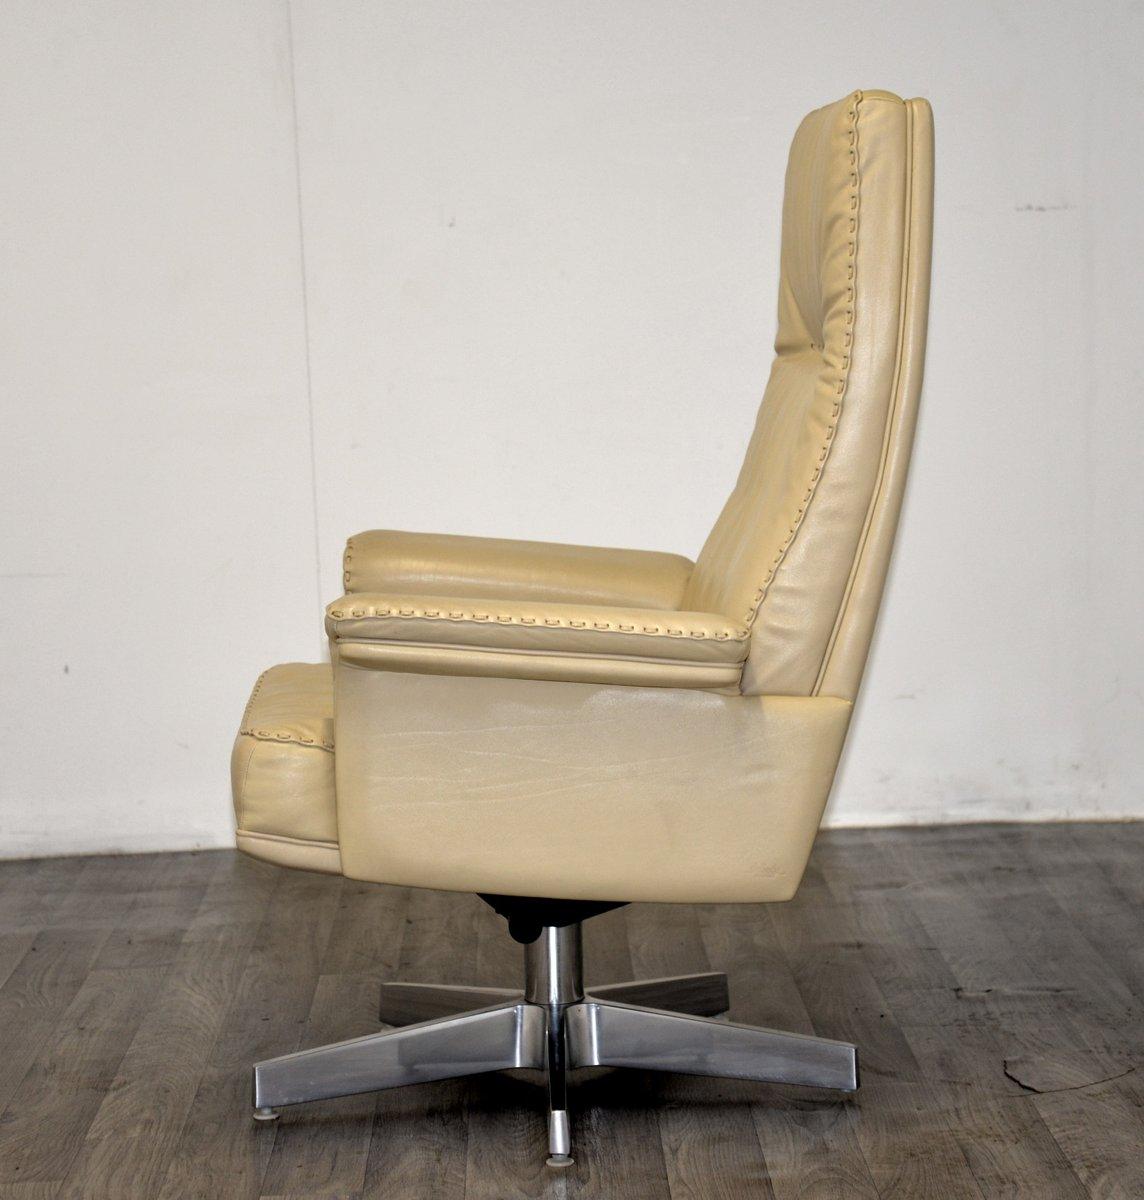 vintage ds 35 sessel ottoman von de sede 1970er bei pamono kaufen. Black Bedroom Furniture Sets. Home Design Ideas